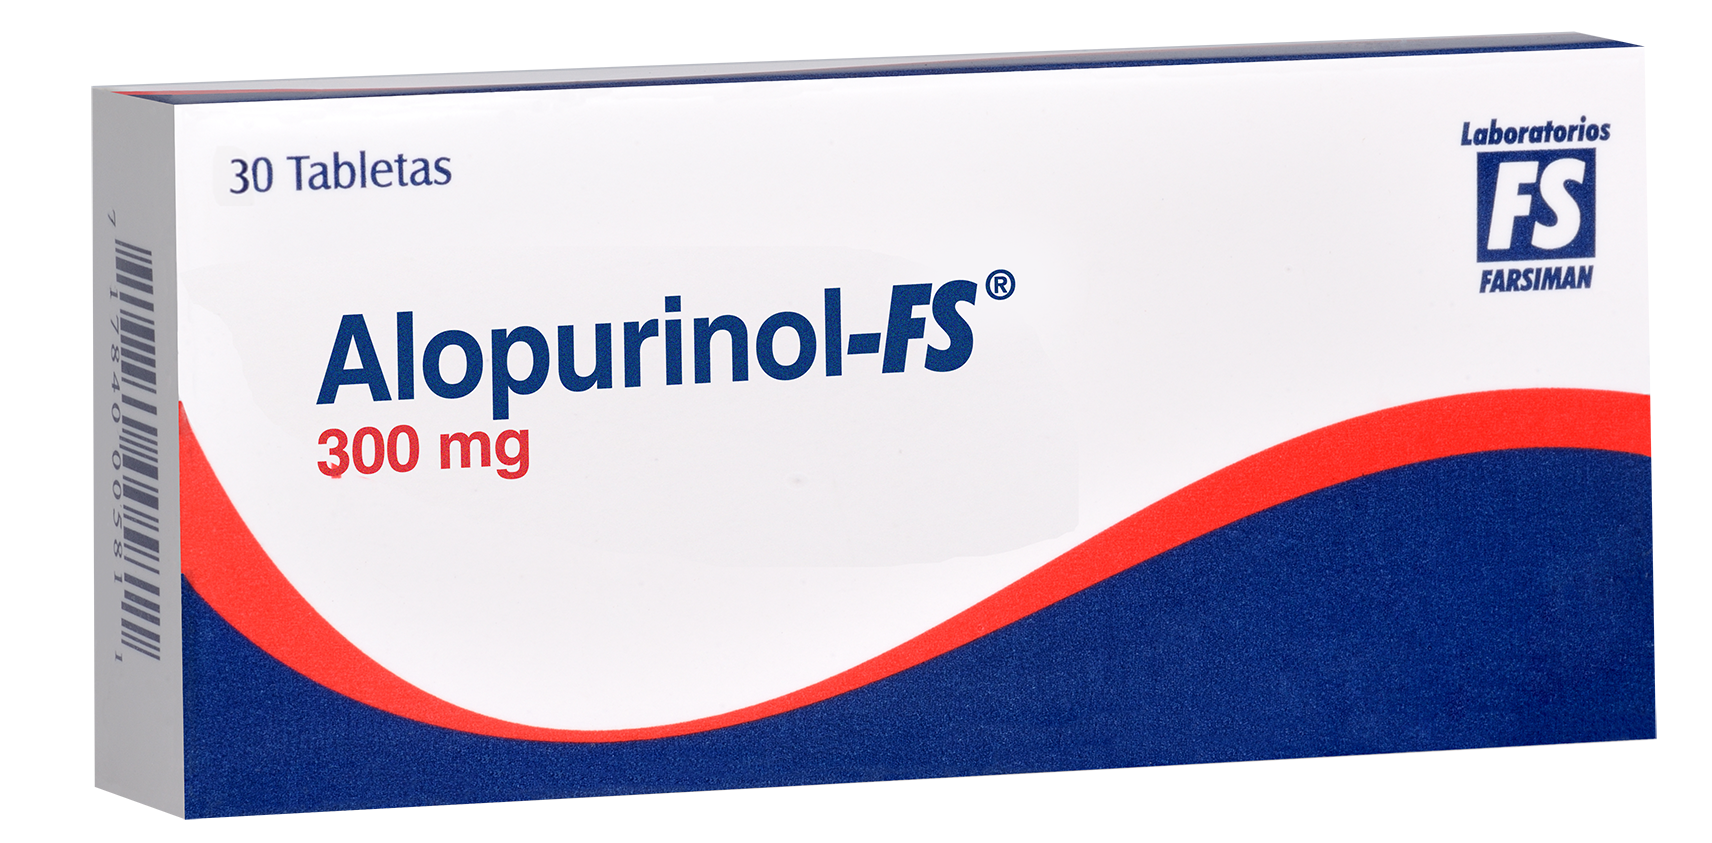 Alopurinol-FS